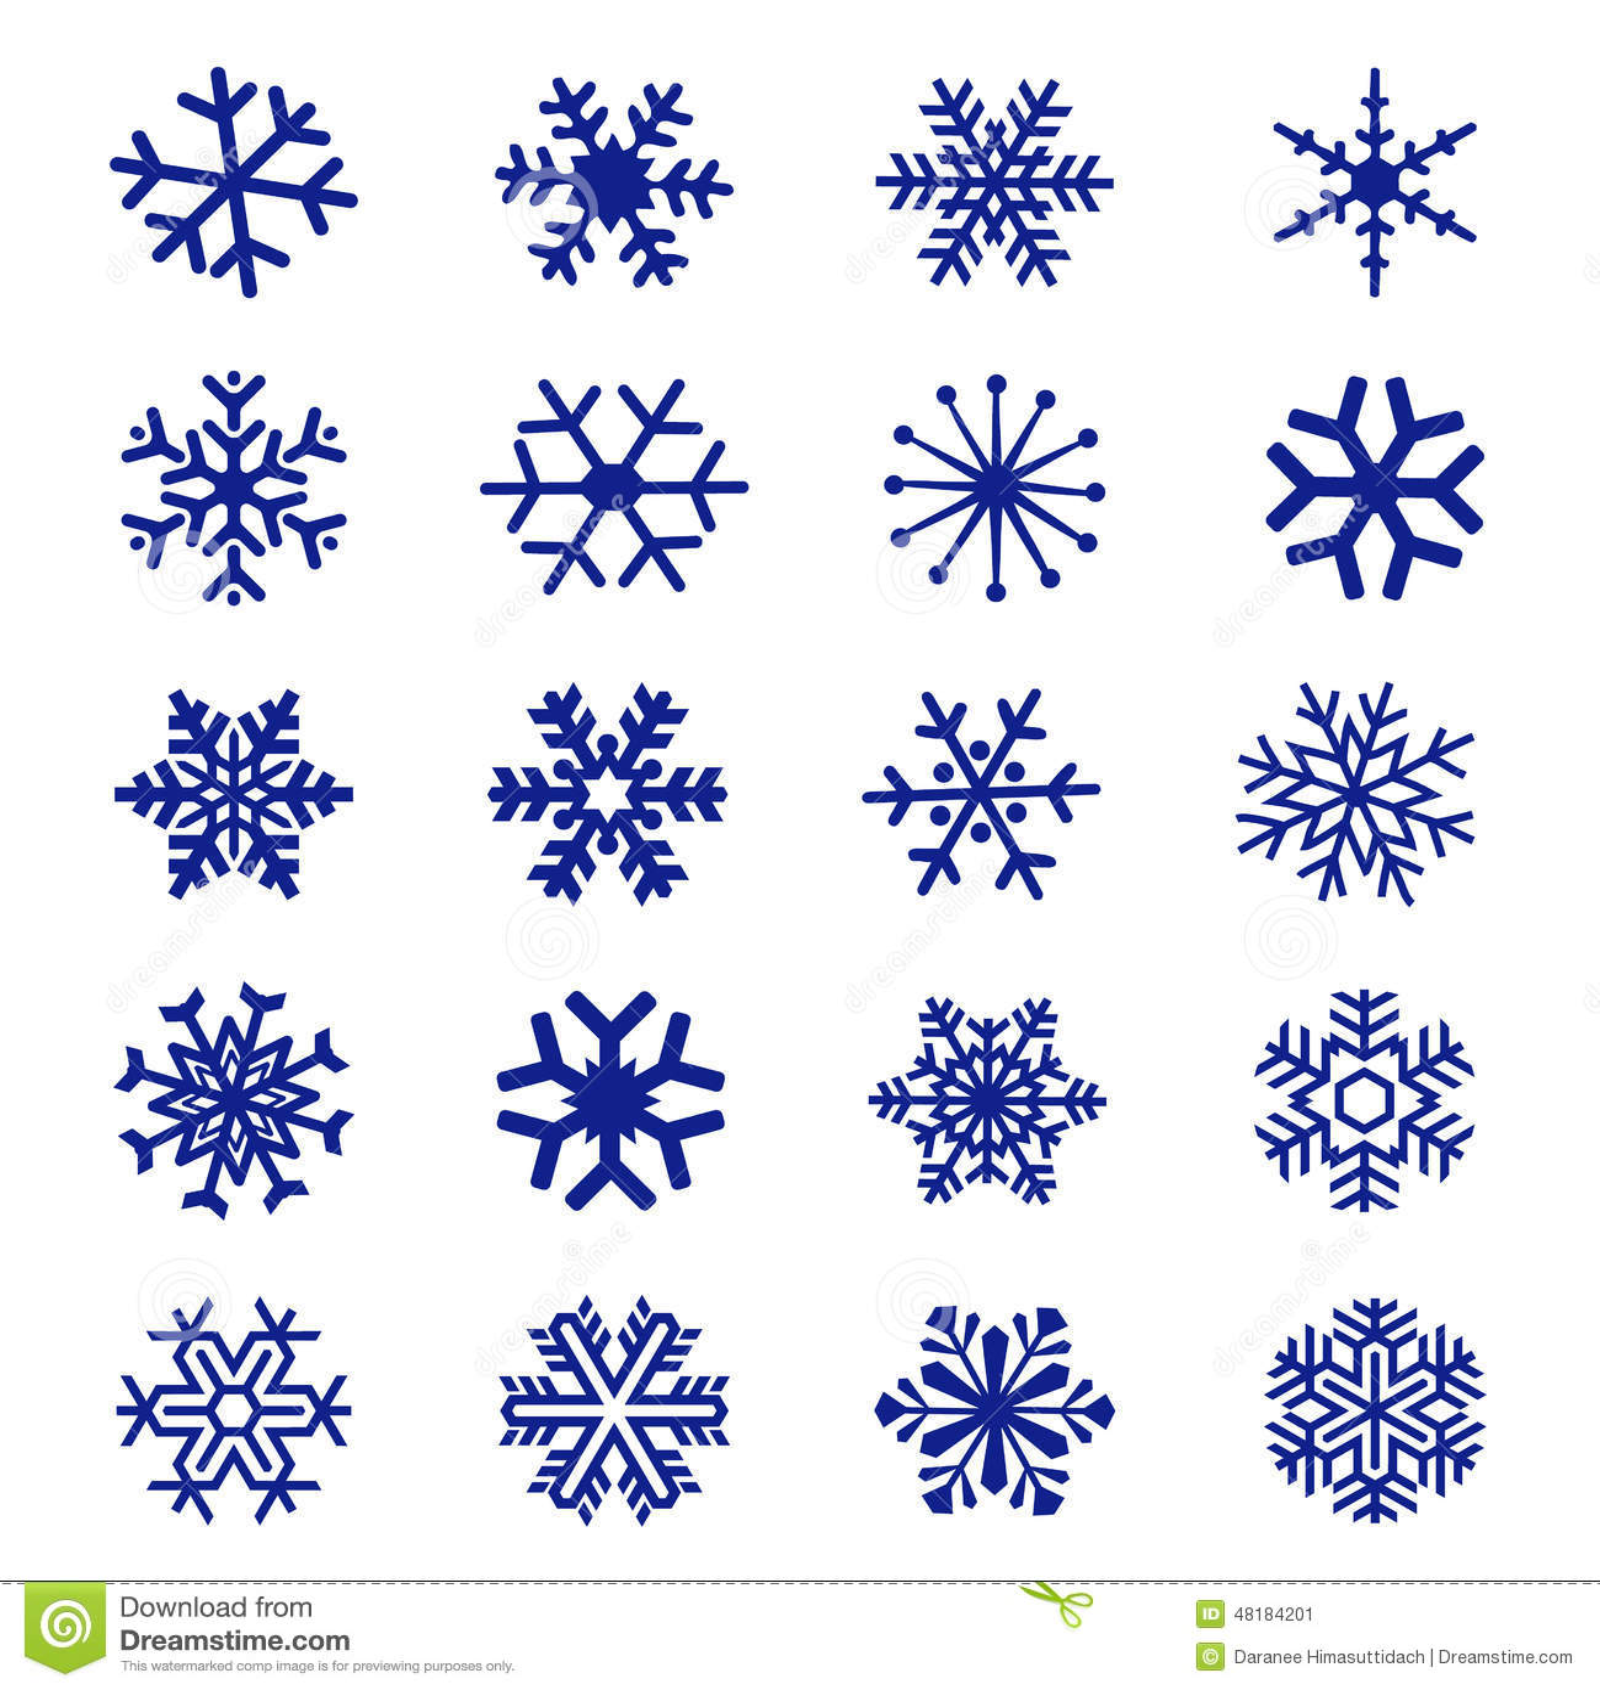 Vecteur d 39 ic ne de flocon de neige illustration de vecteur image 48184201 - Gabarit flocon de neige a decouper ...